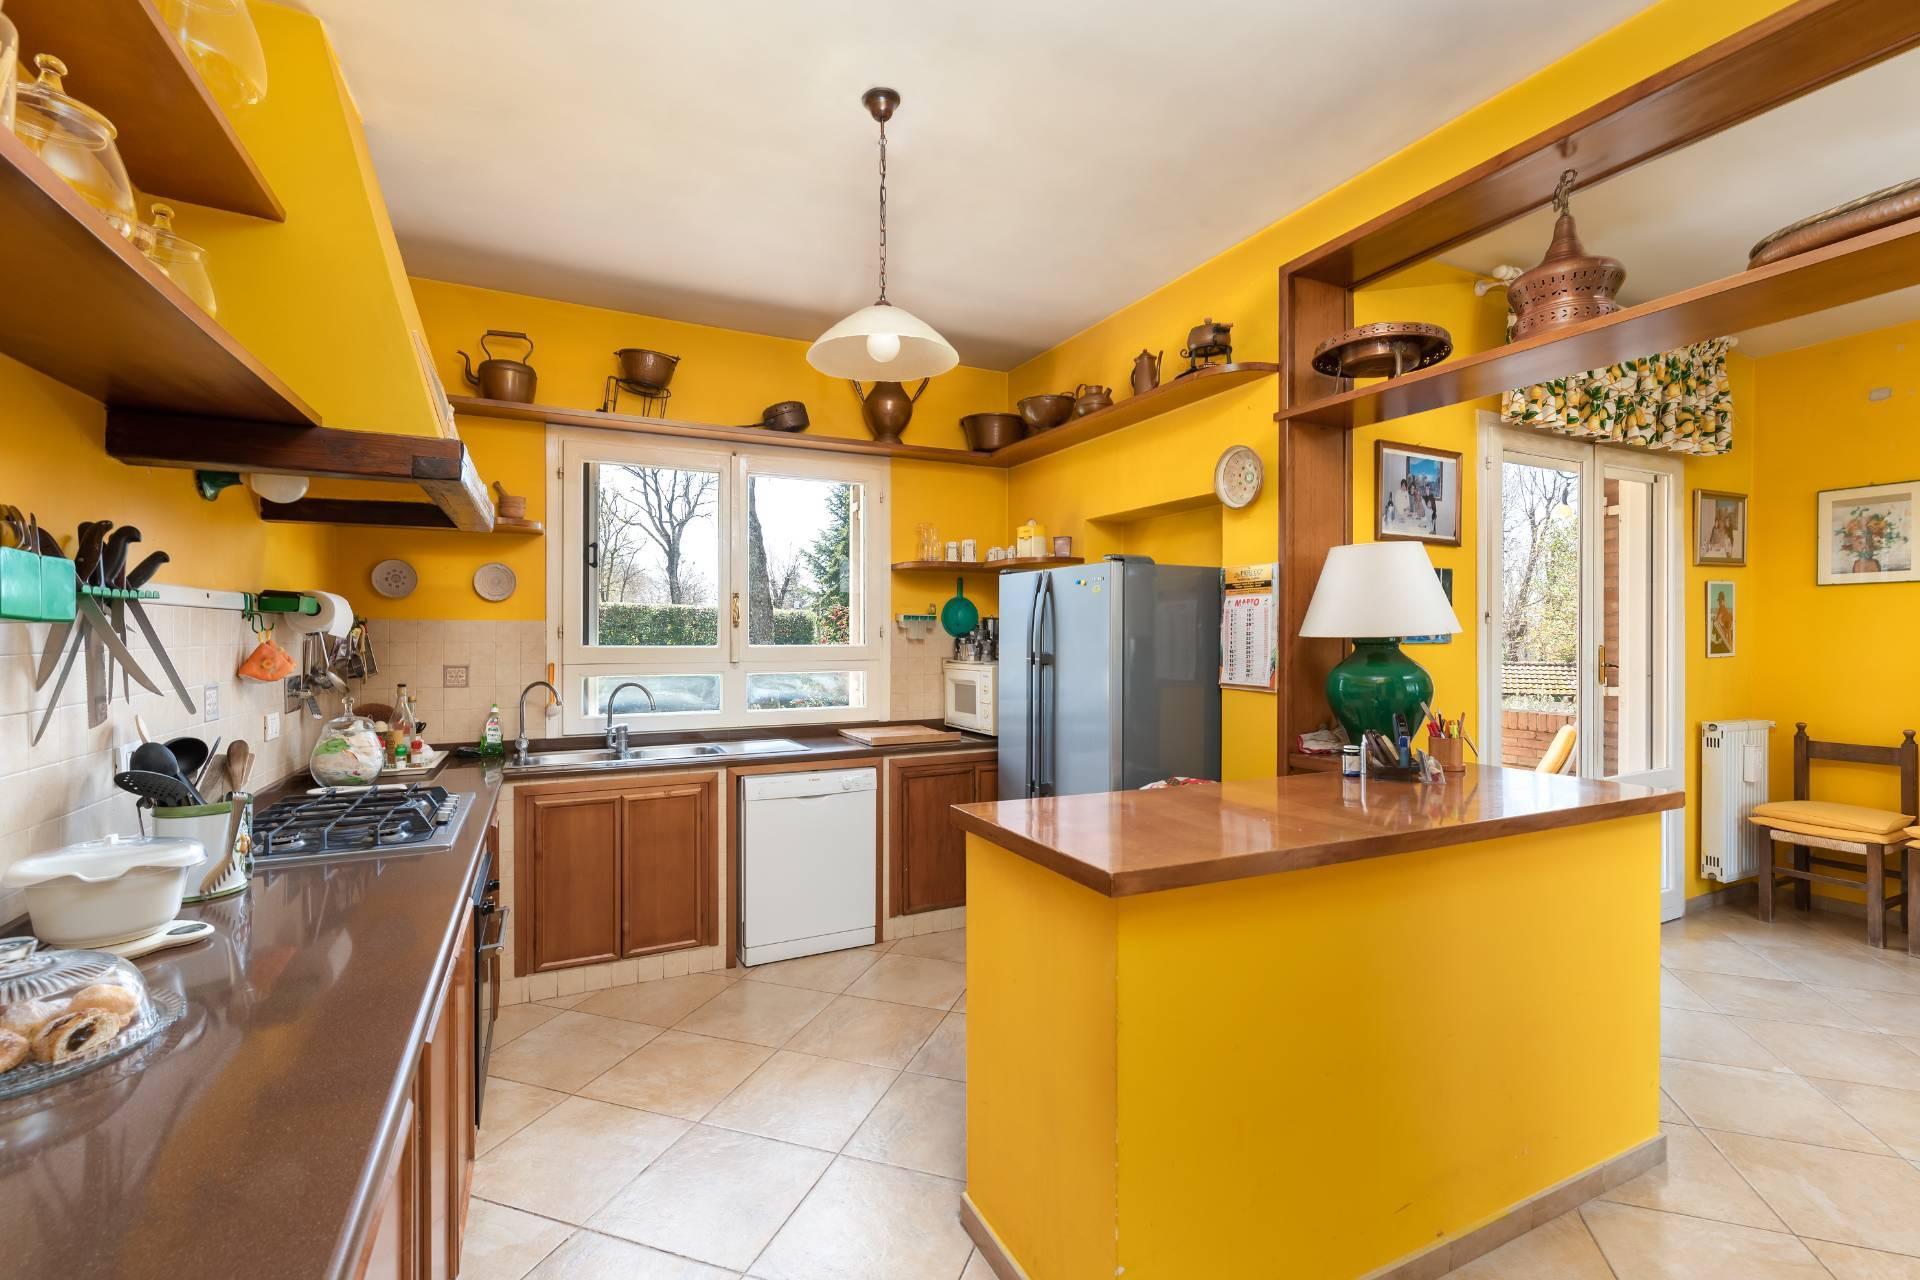 Villa in Vendita a Ariccia: 5 locali, 583 mq - Foto 27